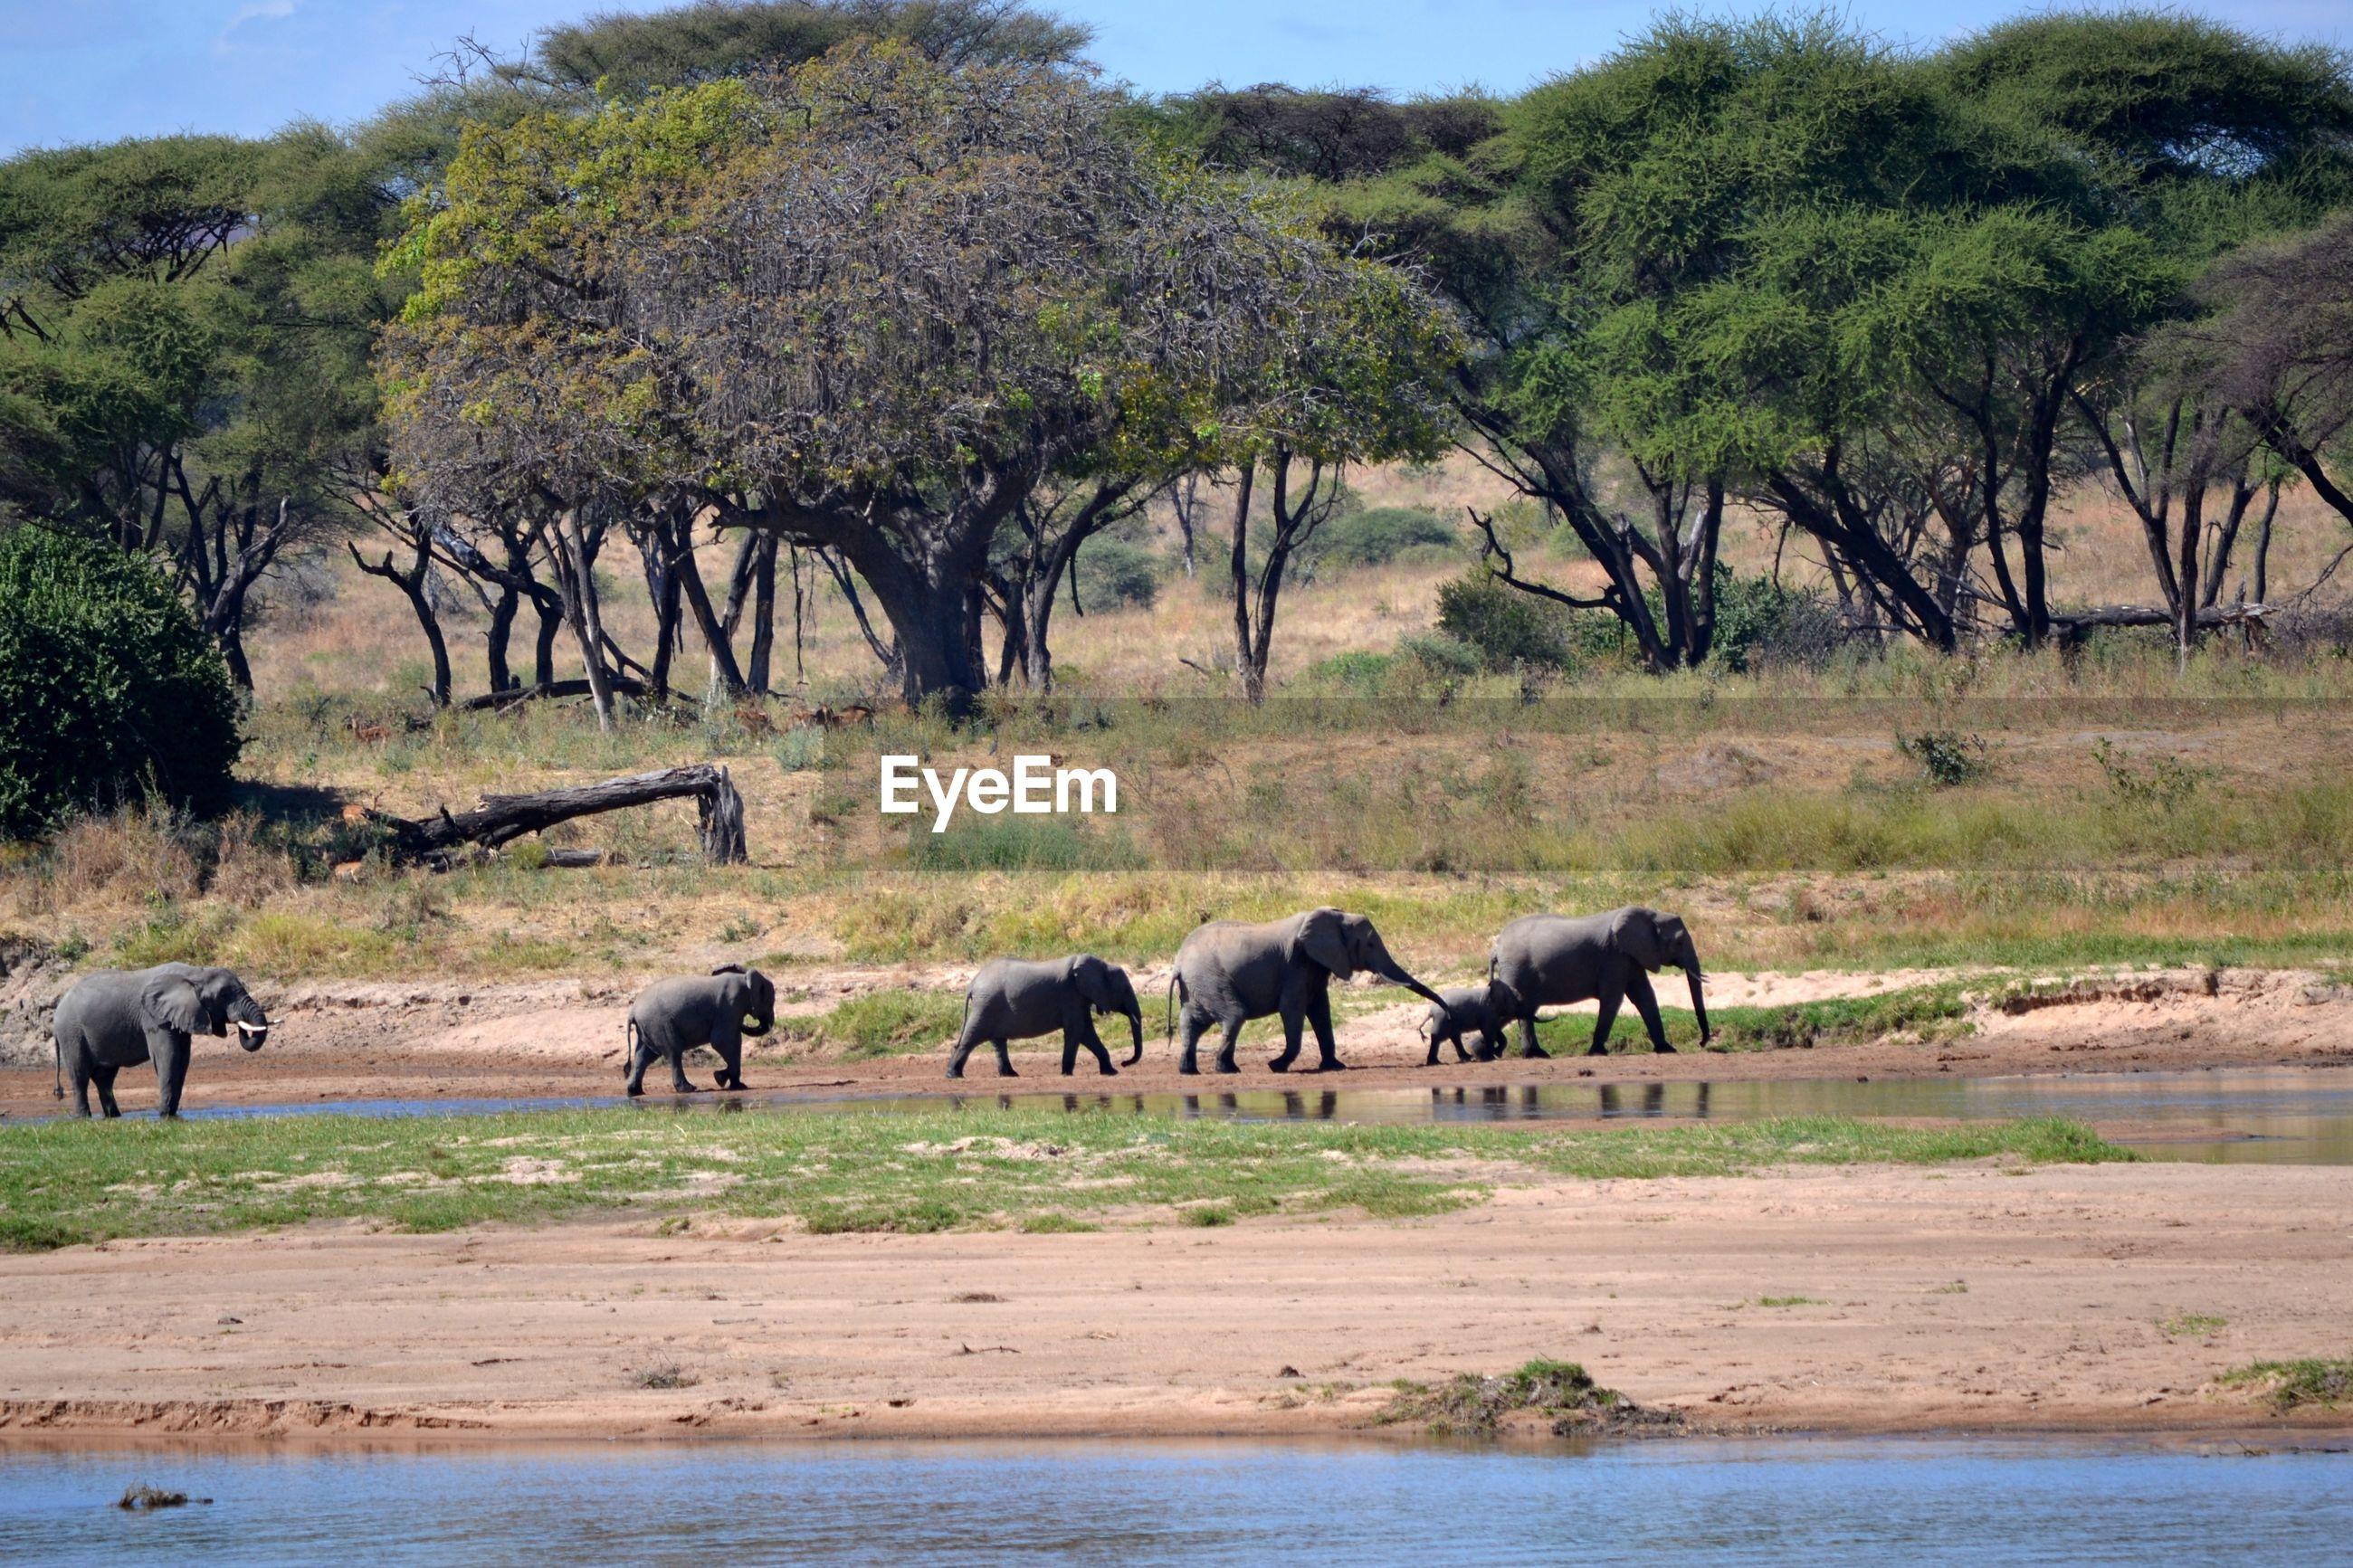 Elephants walking on land against trees